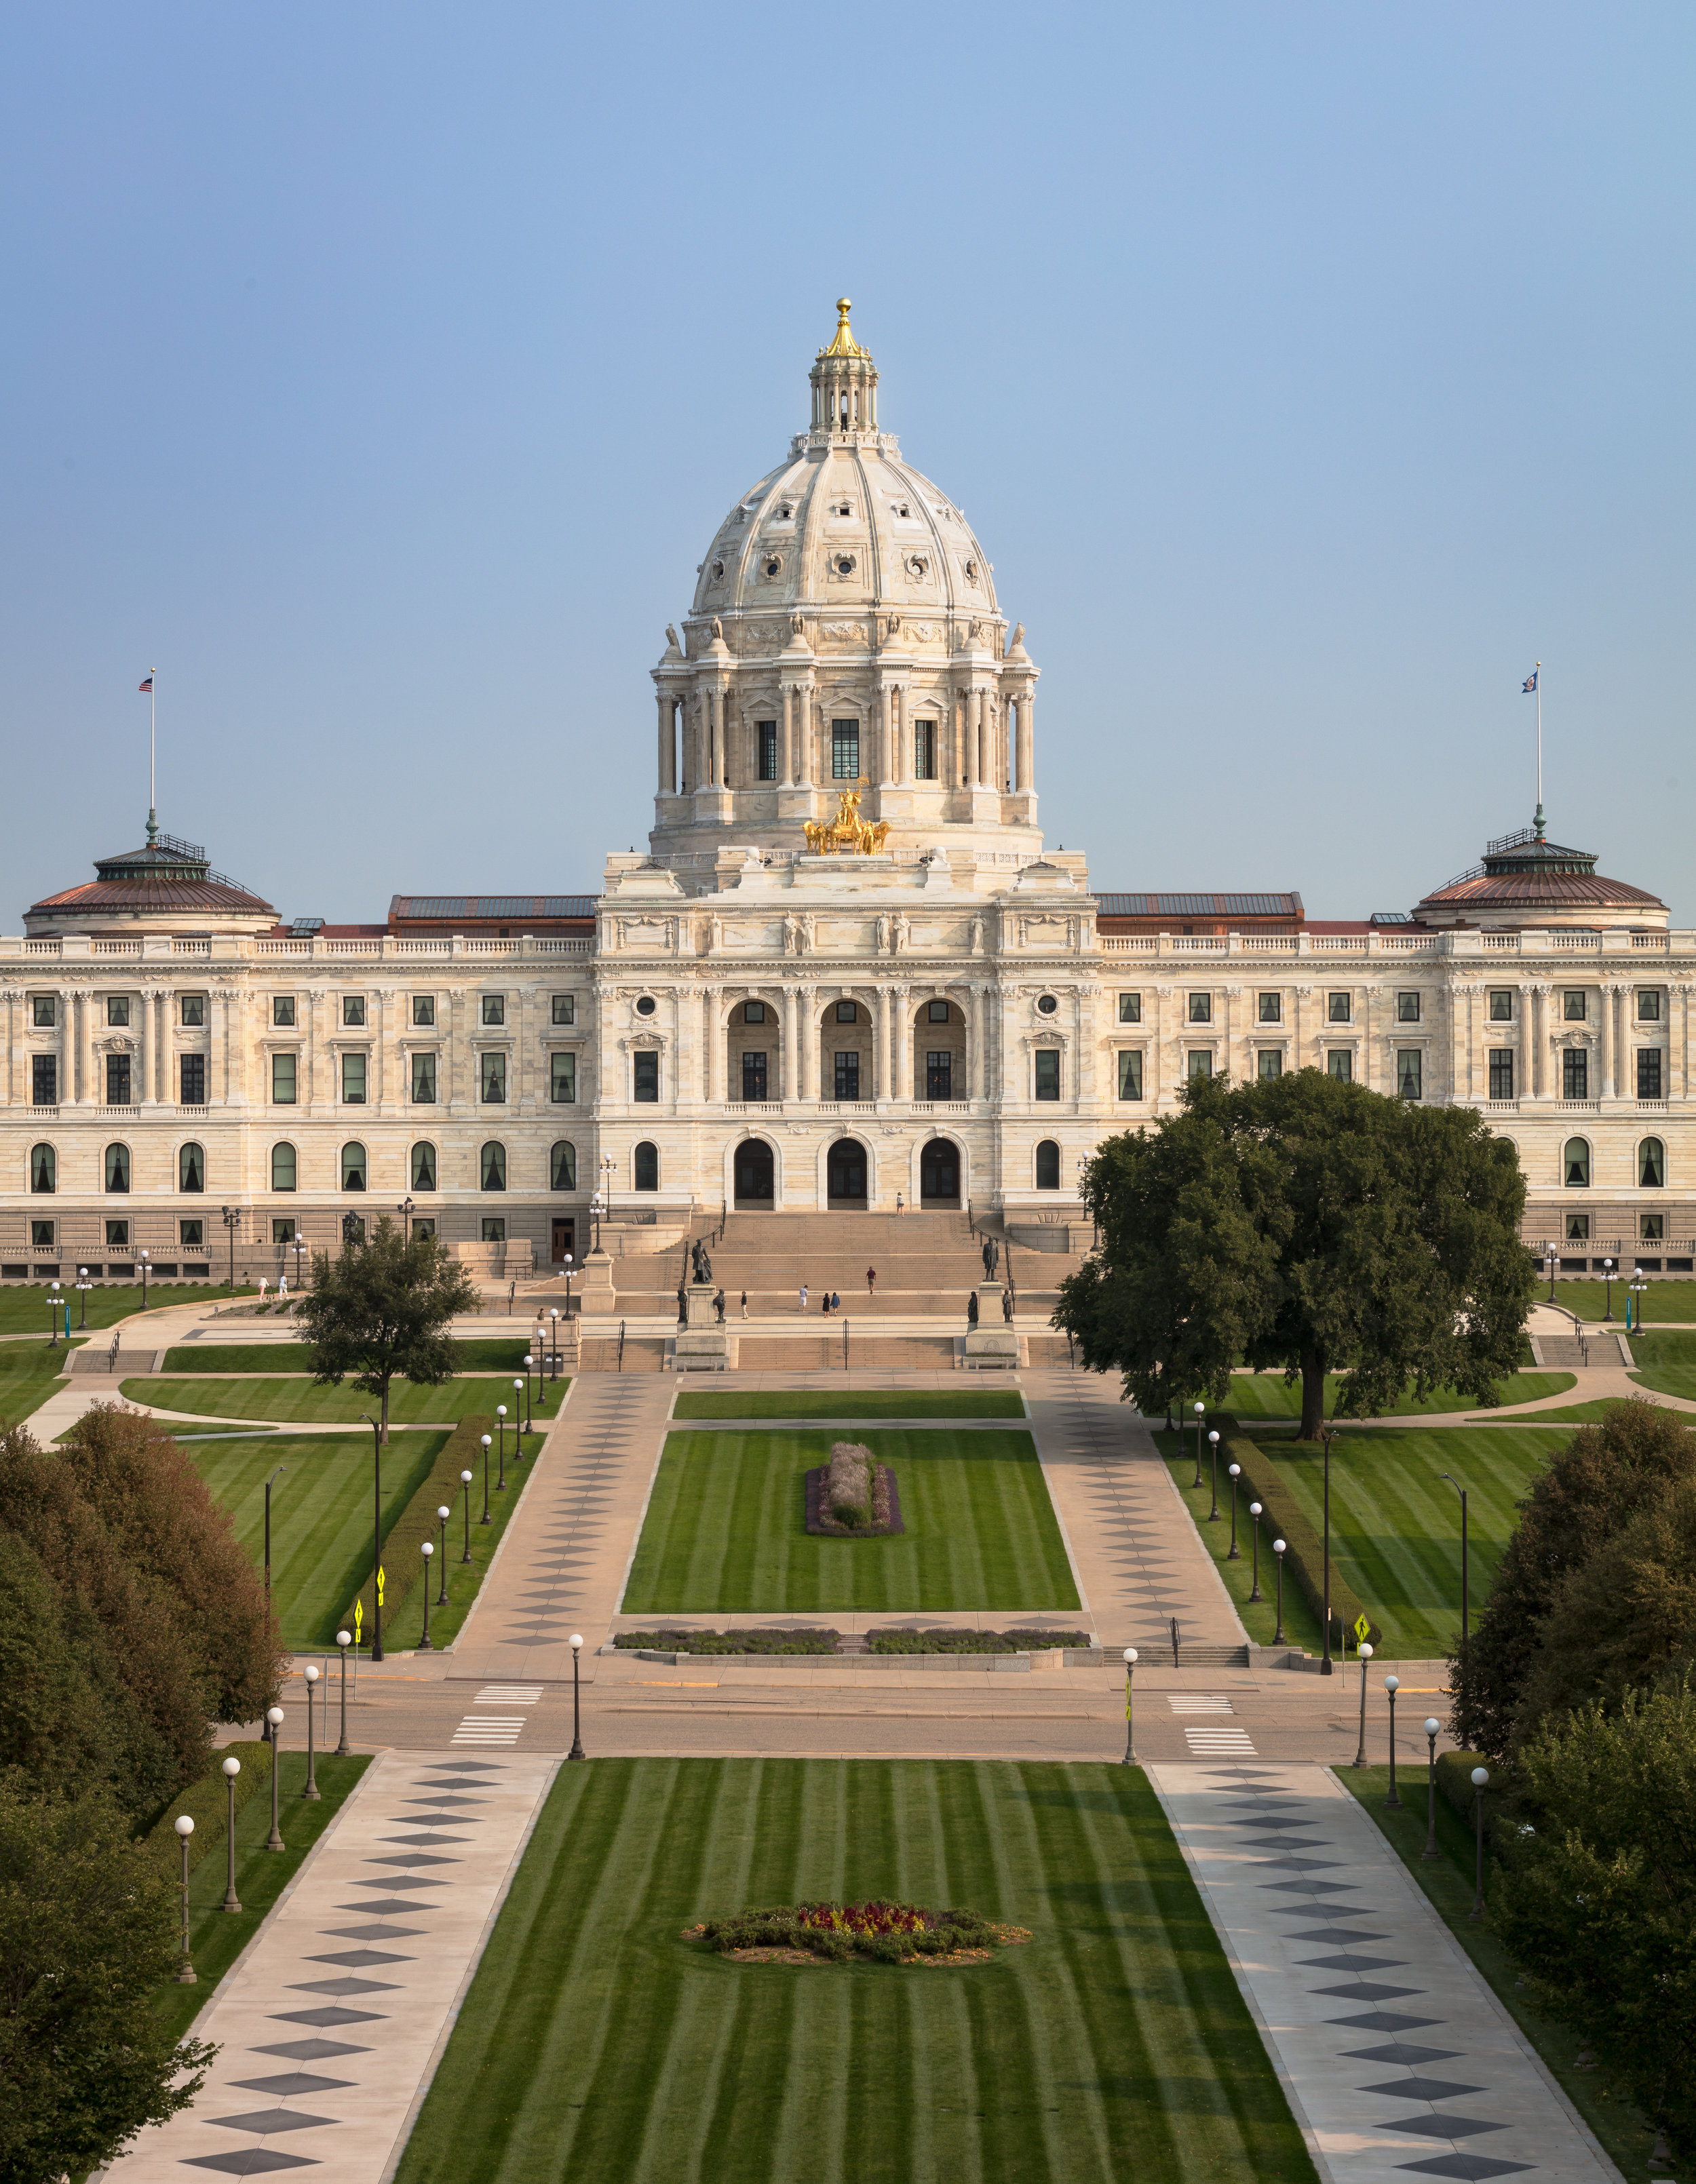 Designer: Minnesota State Capitol